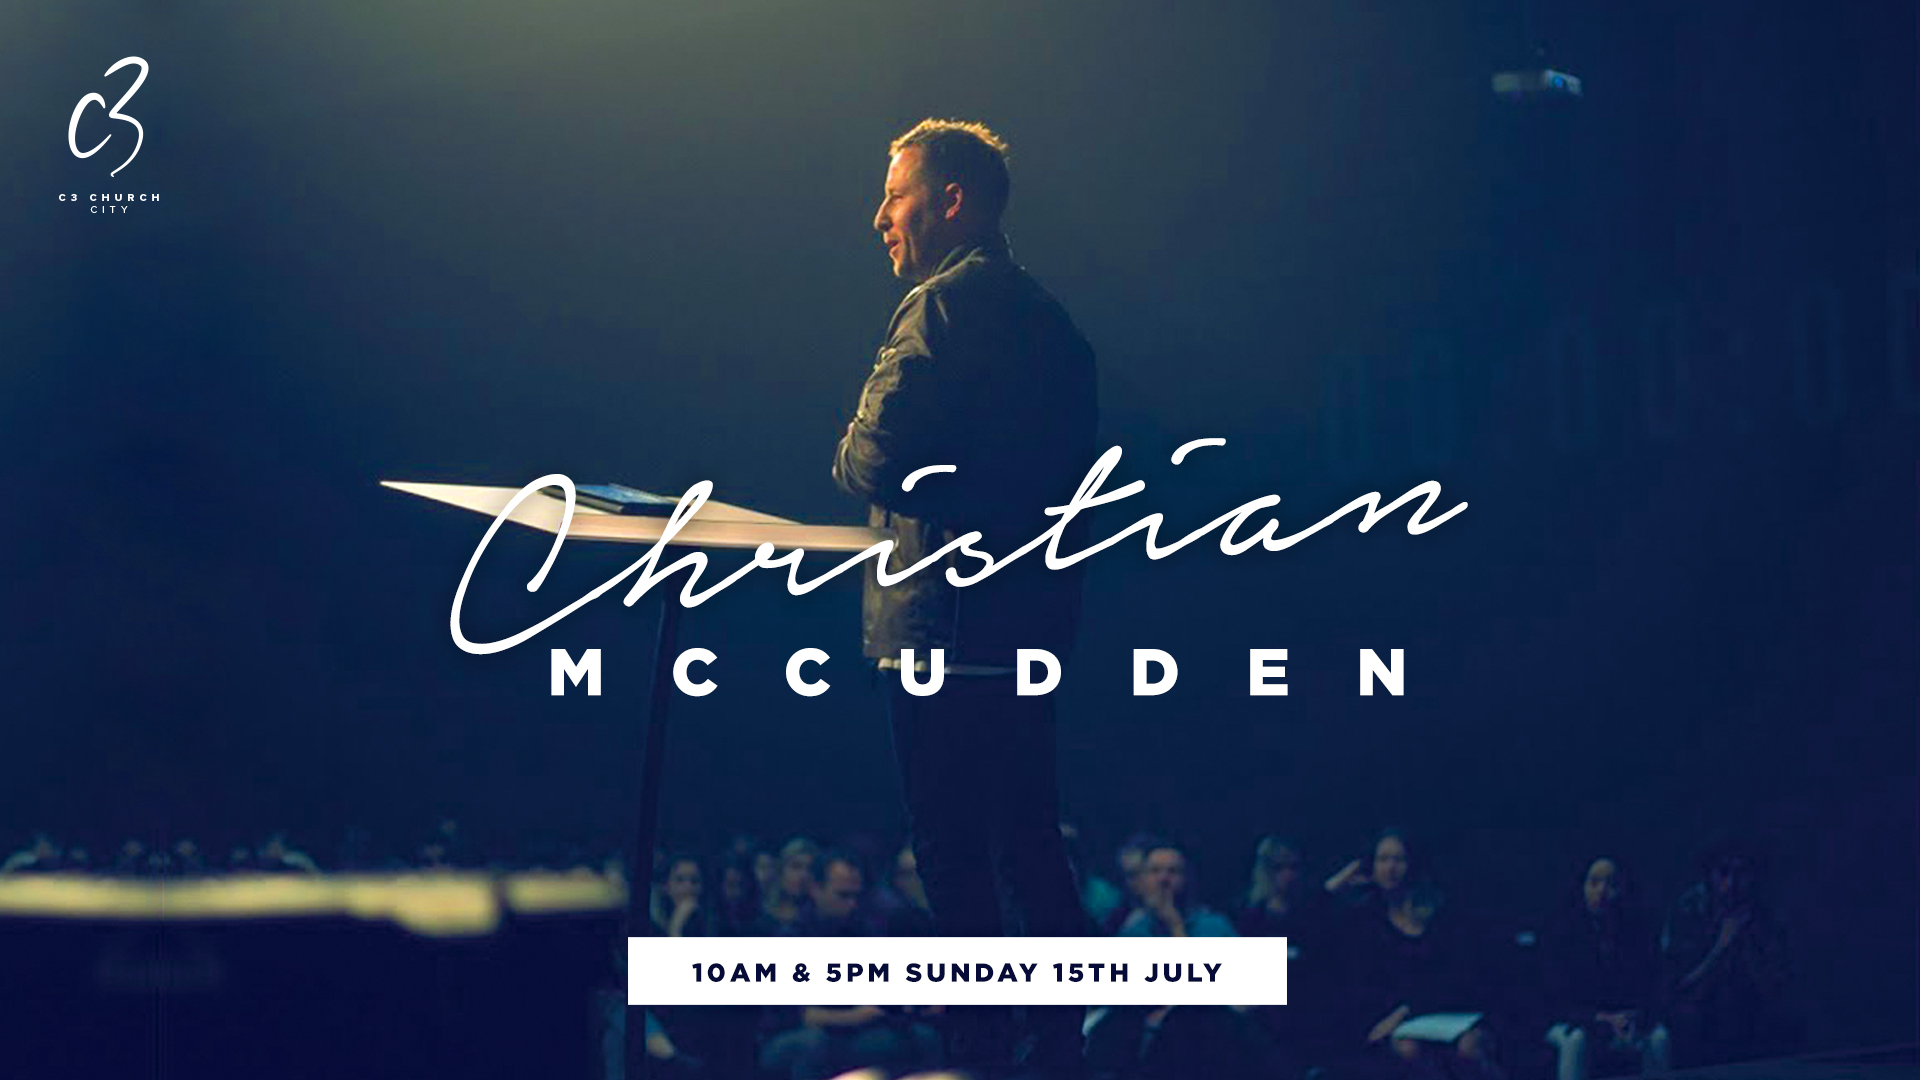 Christian McCudden.jpg